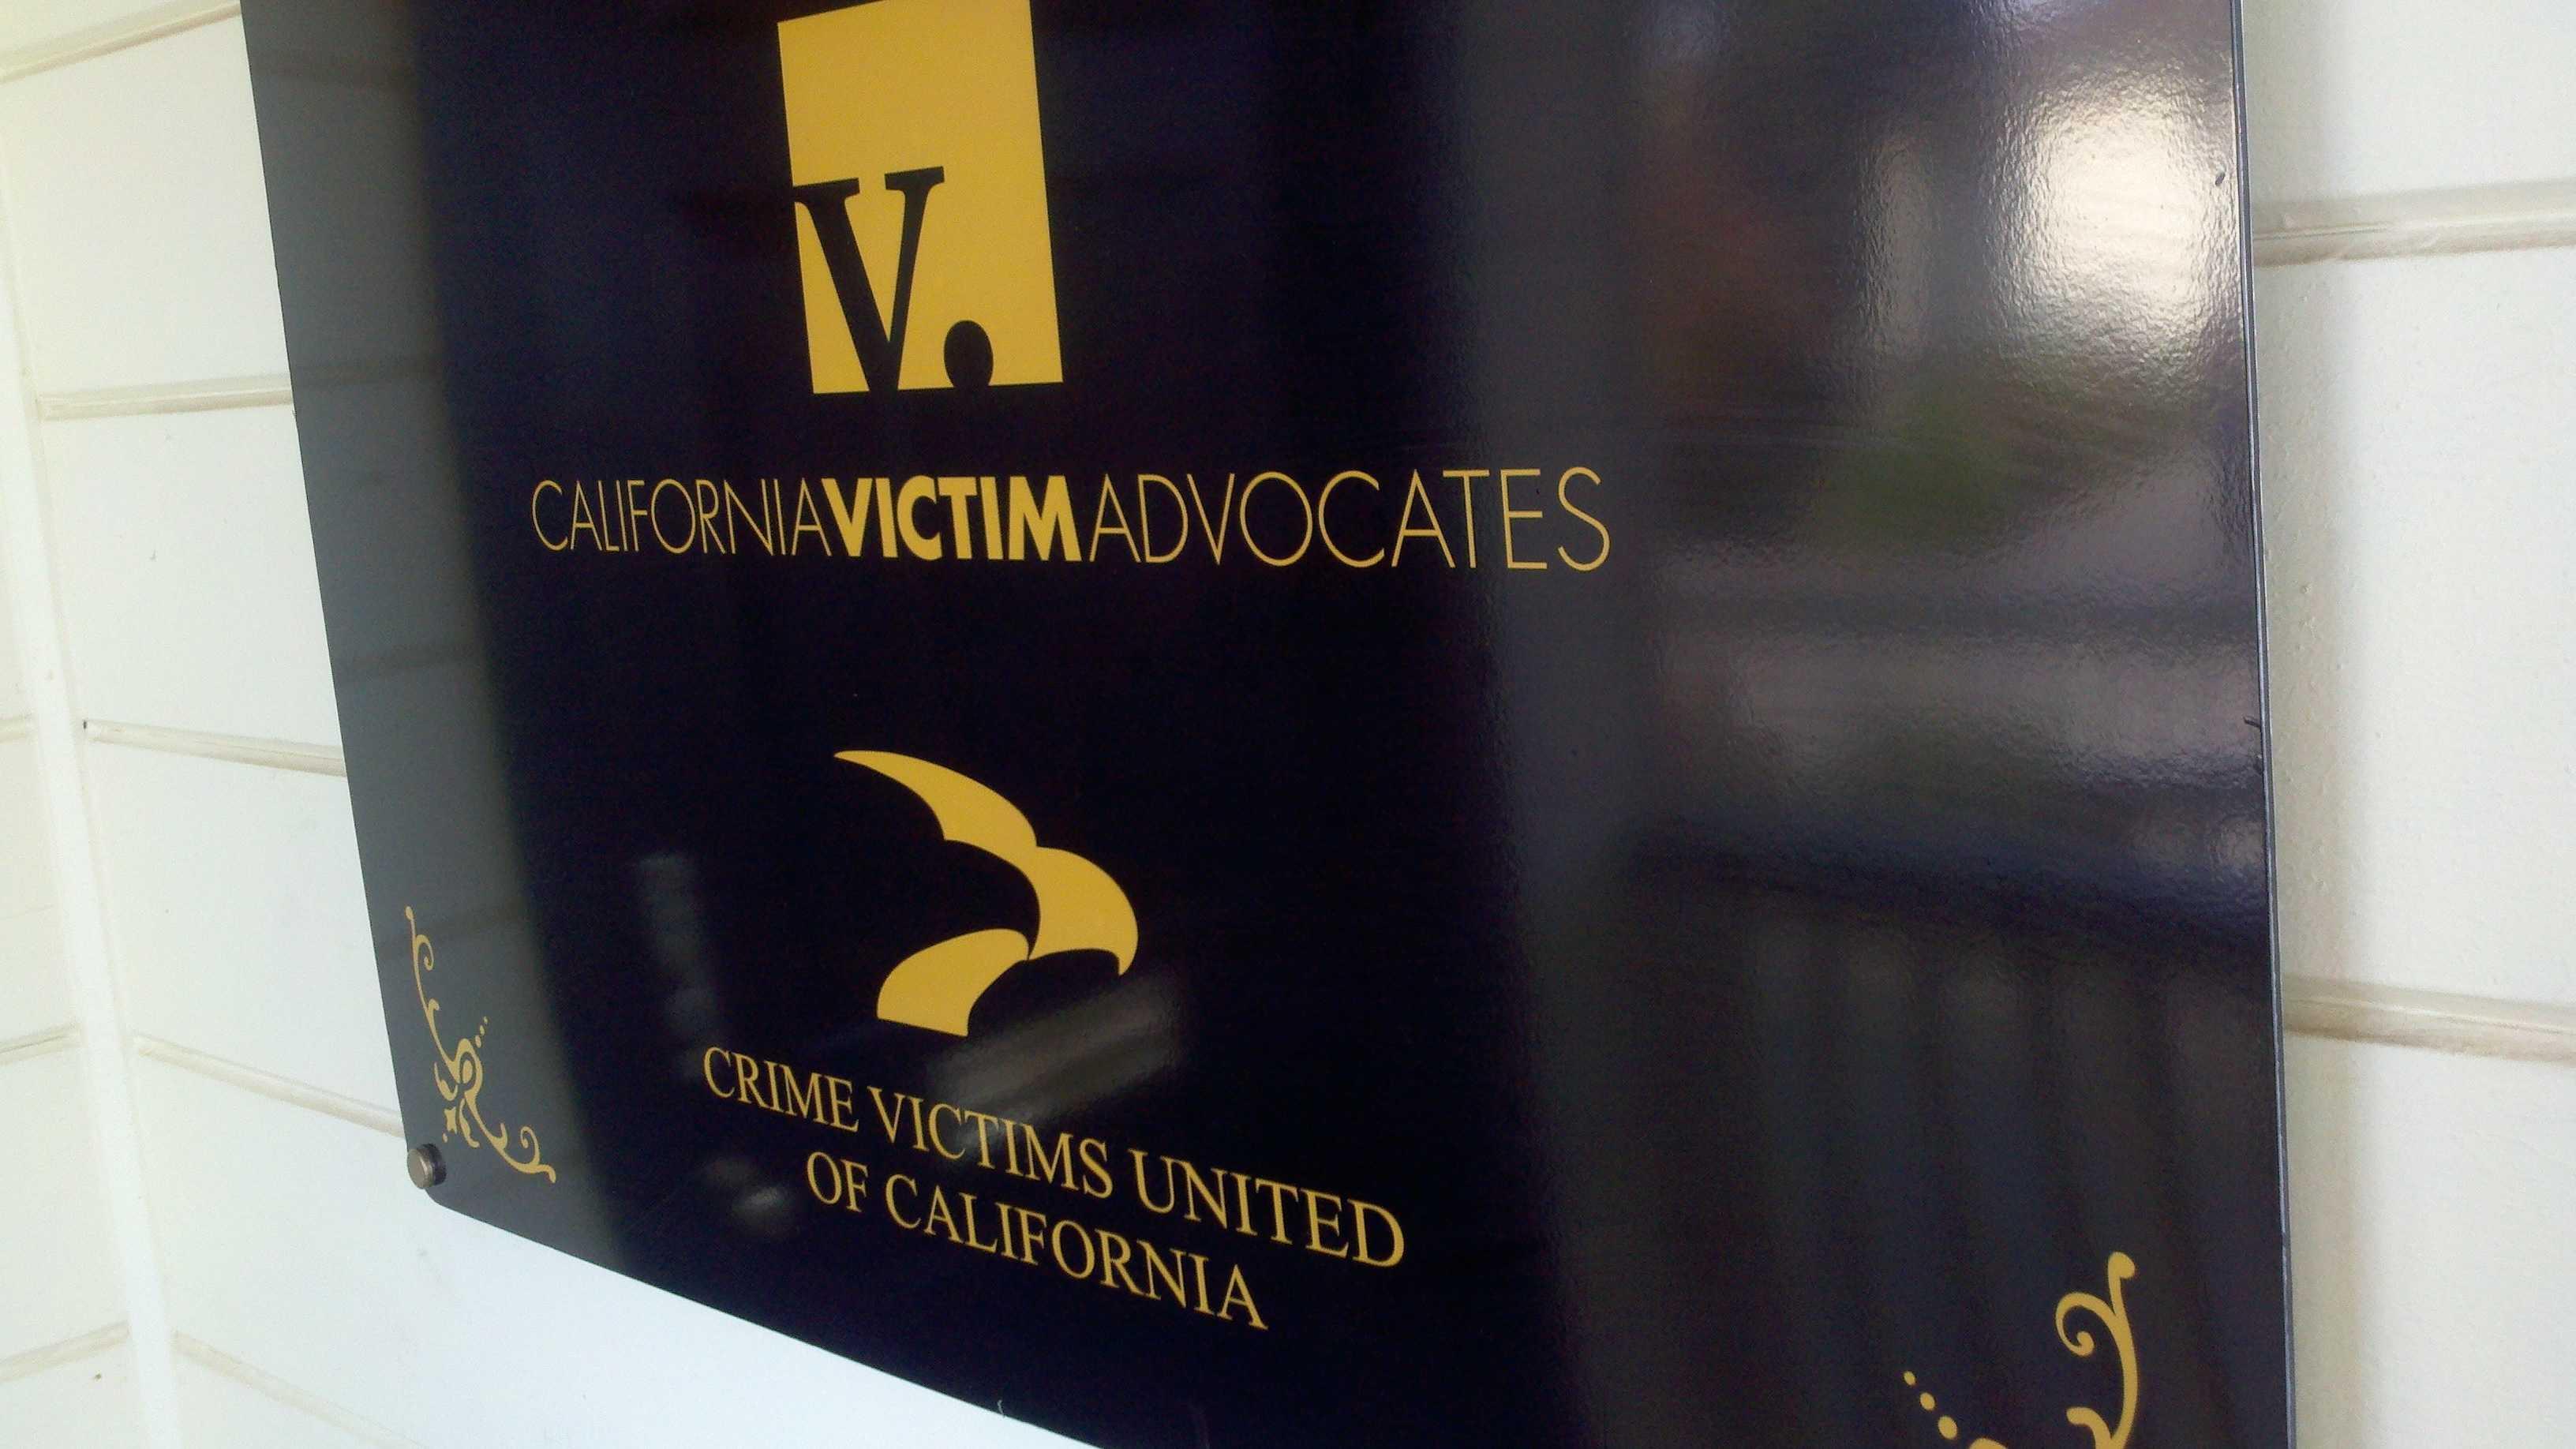 Crime Victims United of California